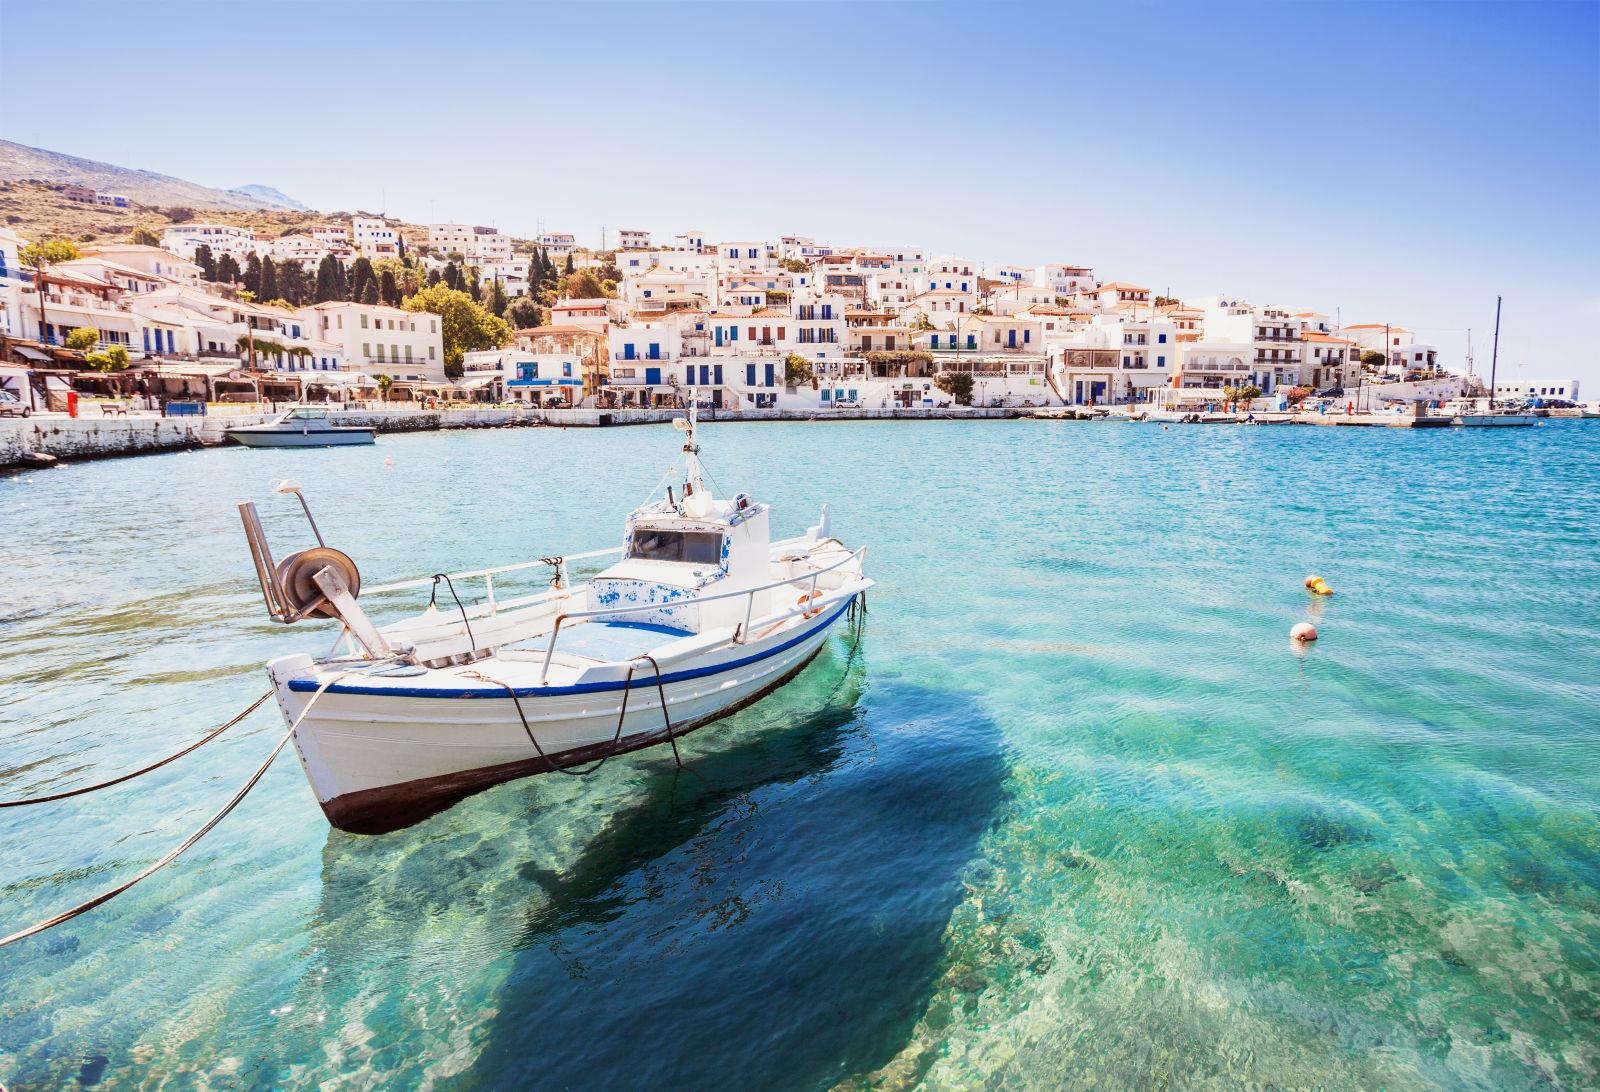 Europe, Greece, South Aegean